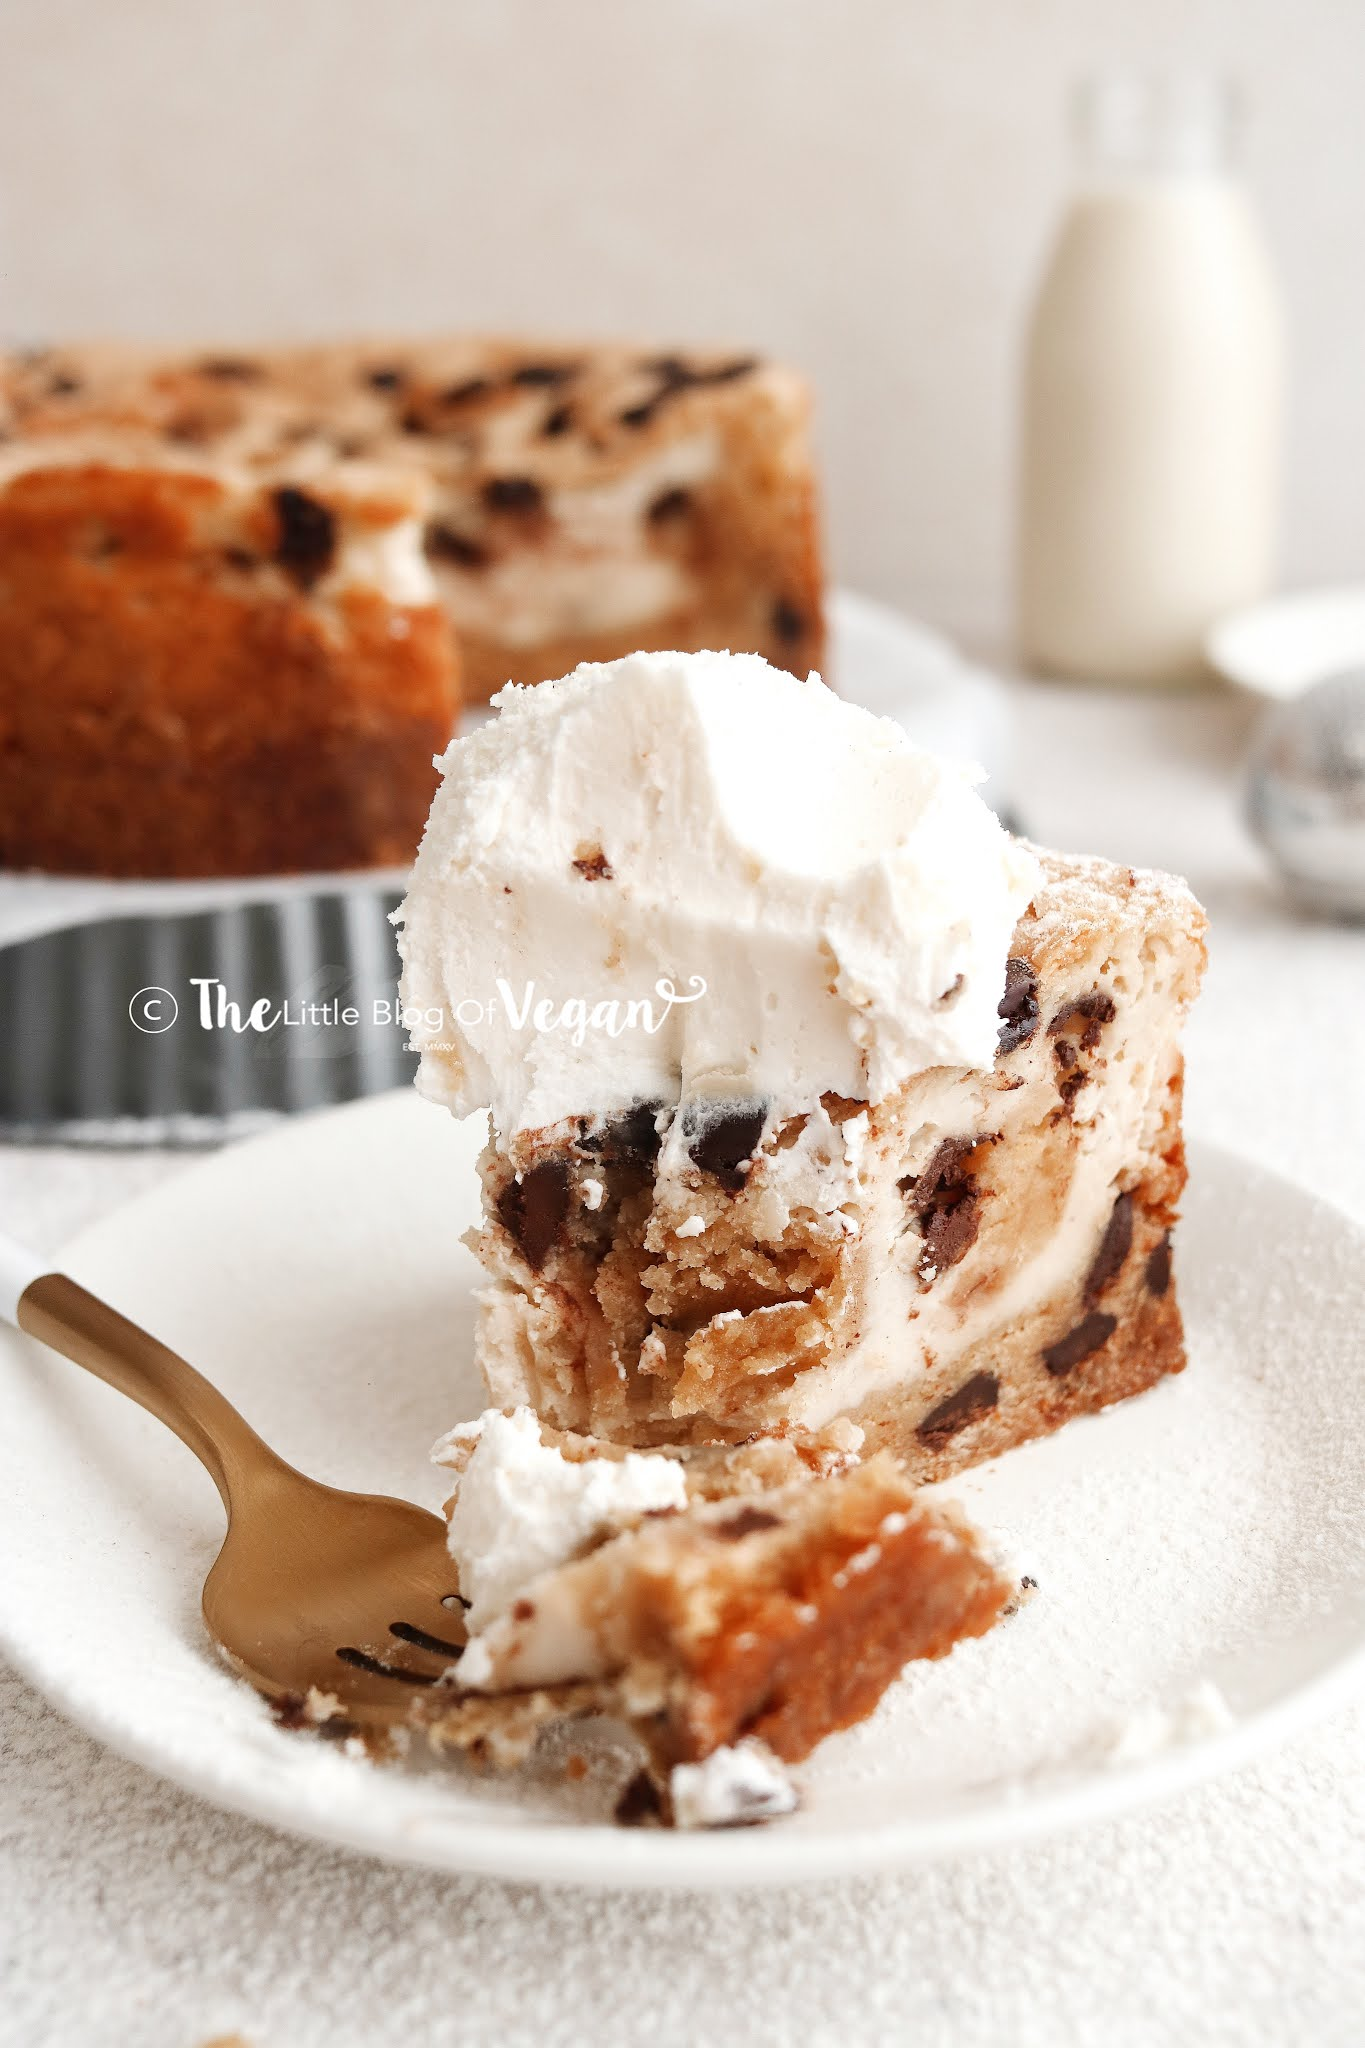 slice-of-cookie-dough-cheesecake-and-icecream